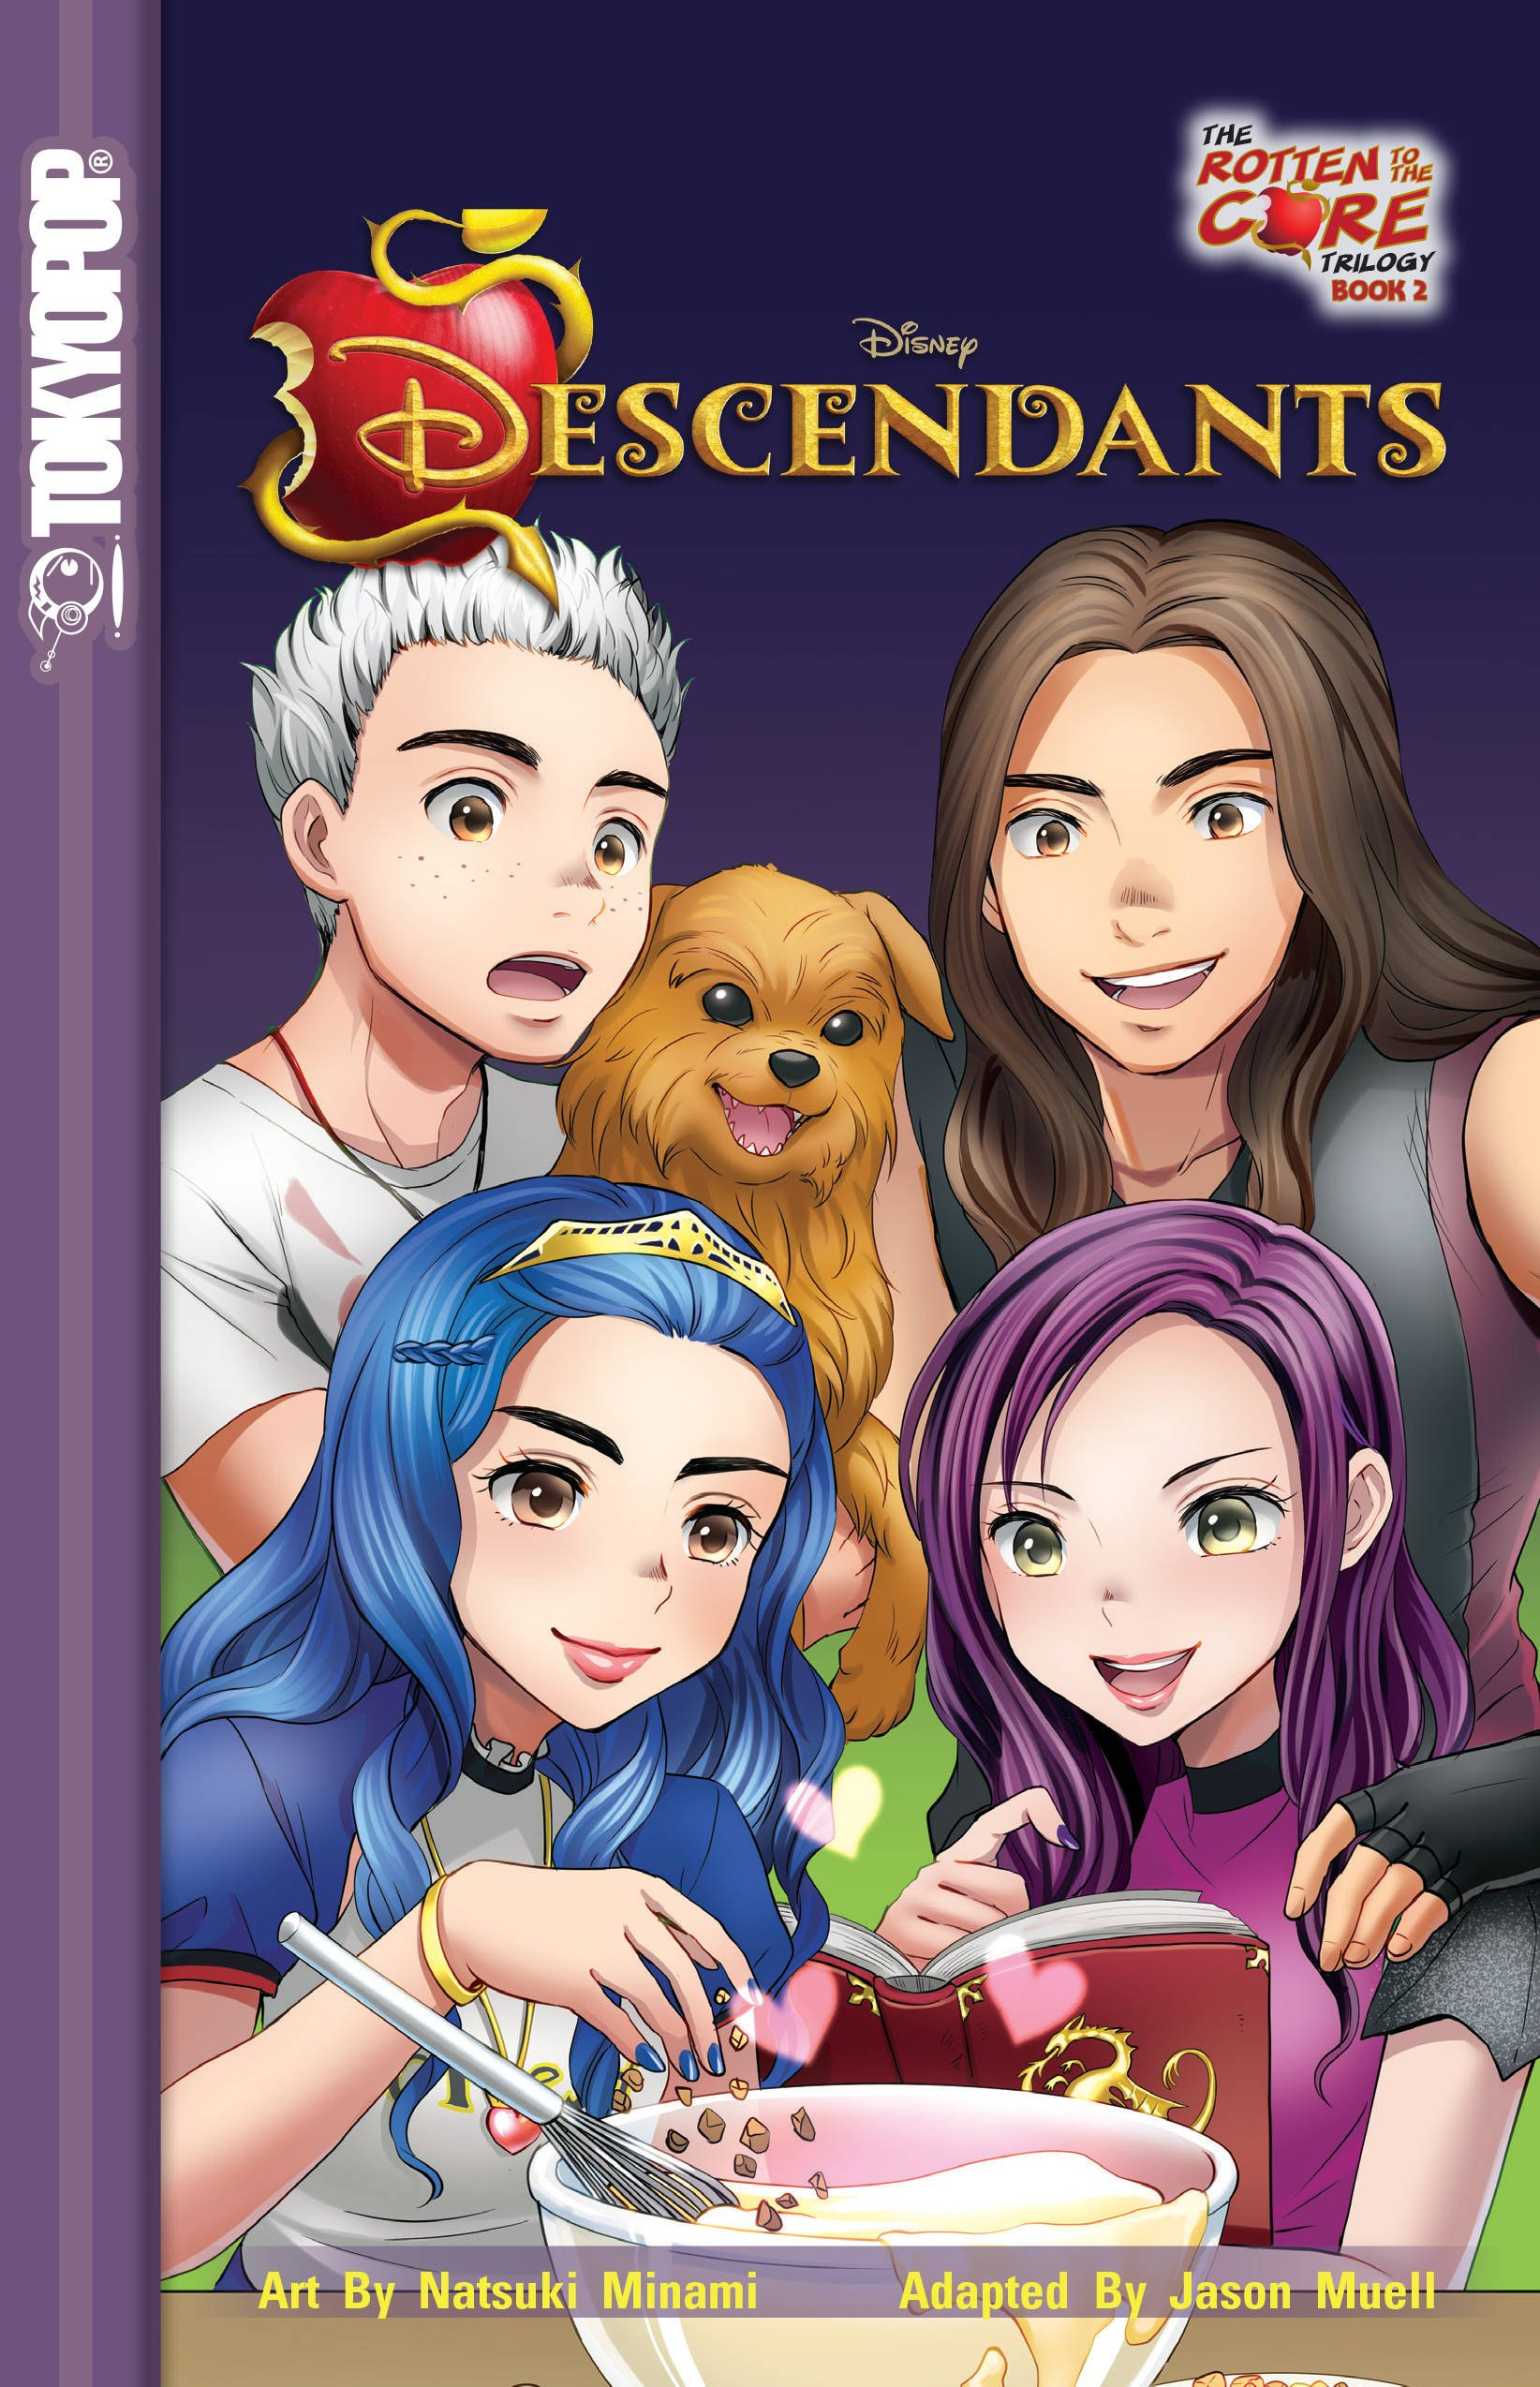 Disney Manga  Descendants   The Rotten To The Core Trilogy Book 2